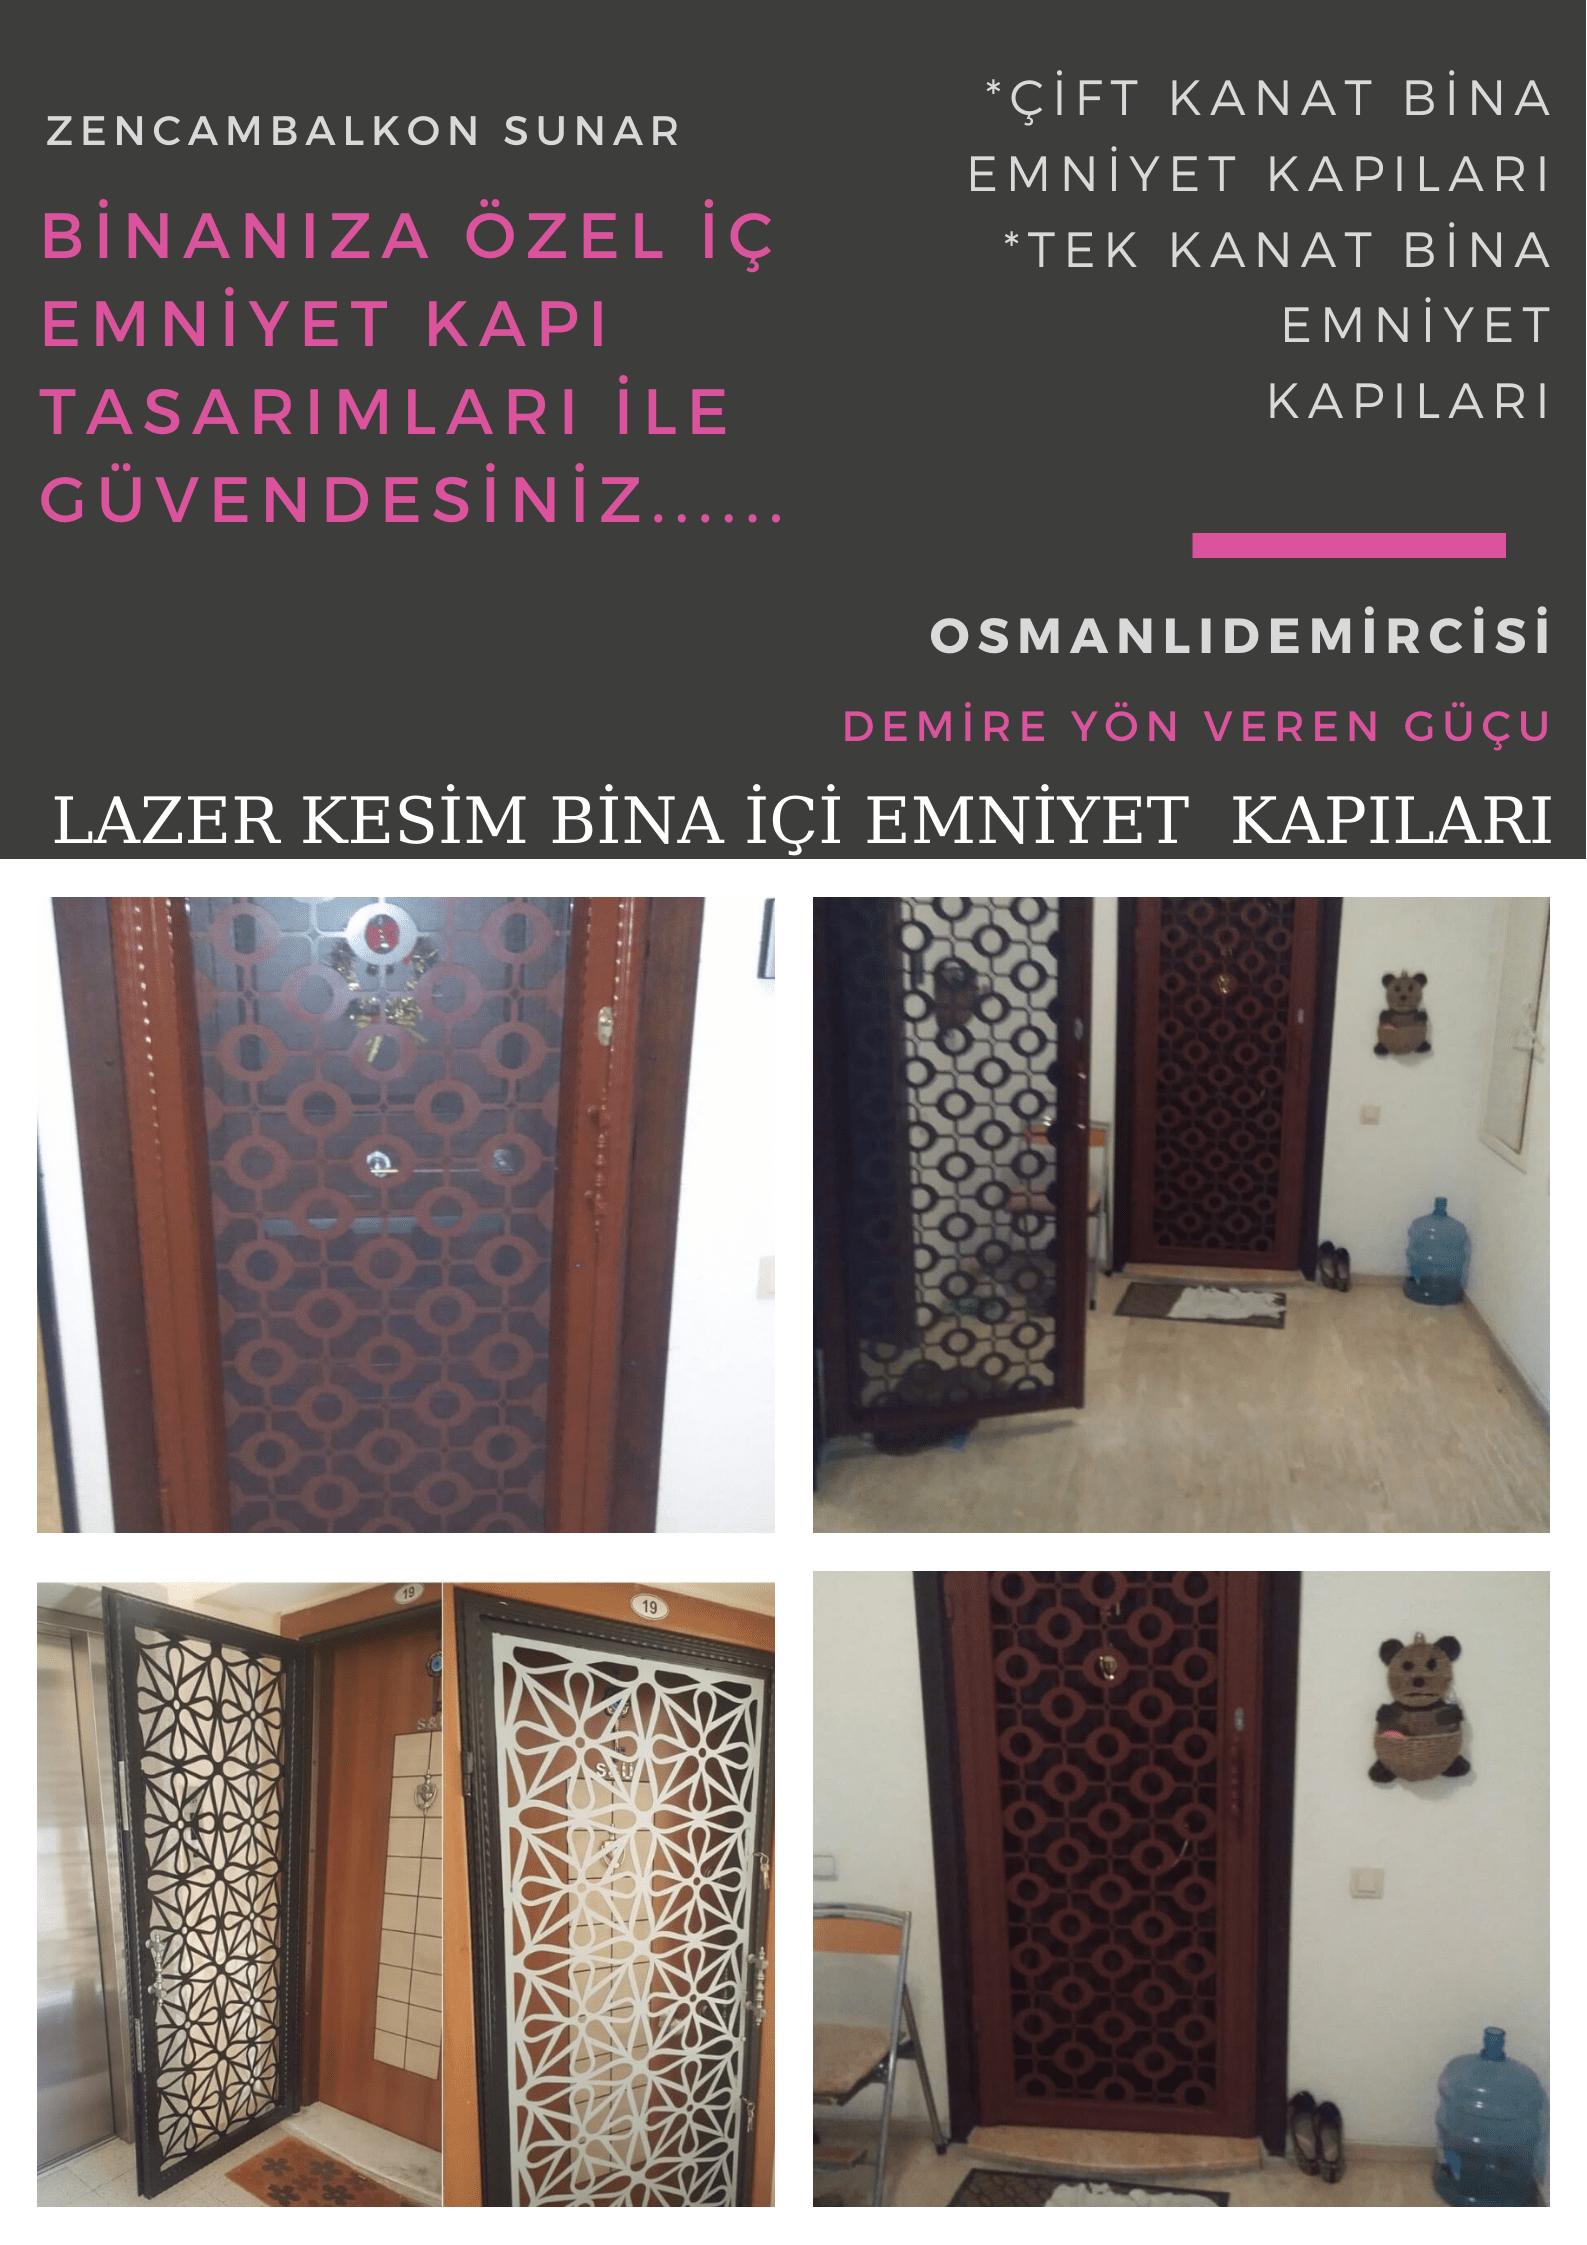 Lazer kesim bina iç emniyet kapısı İzmir